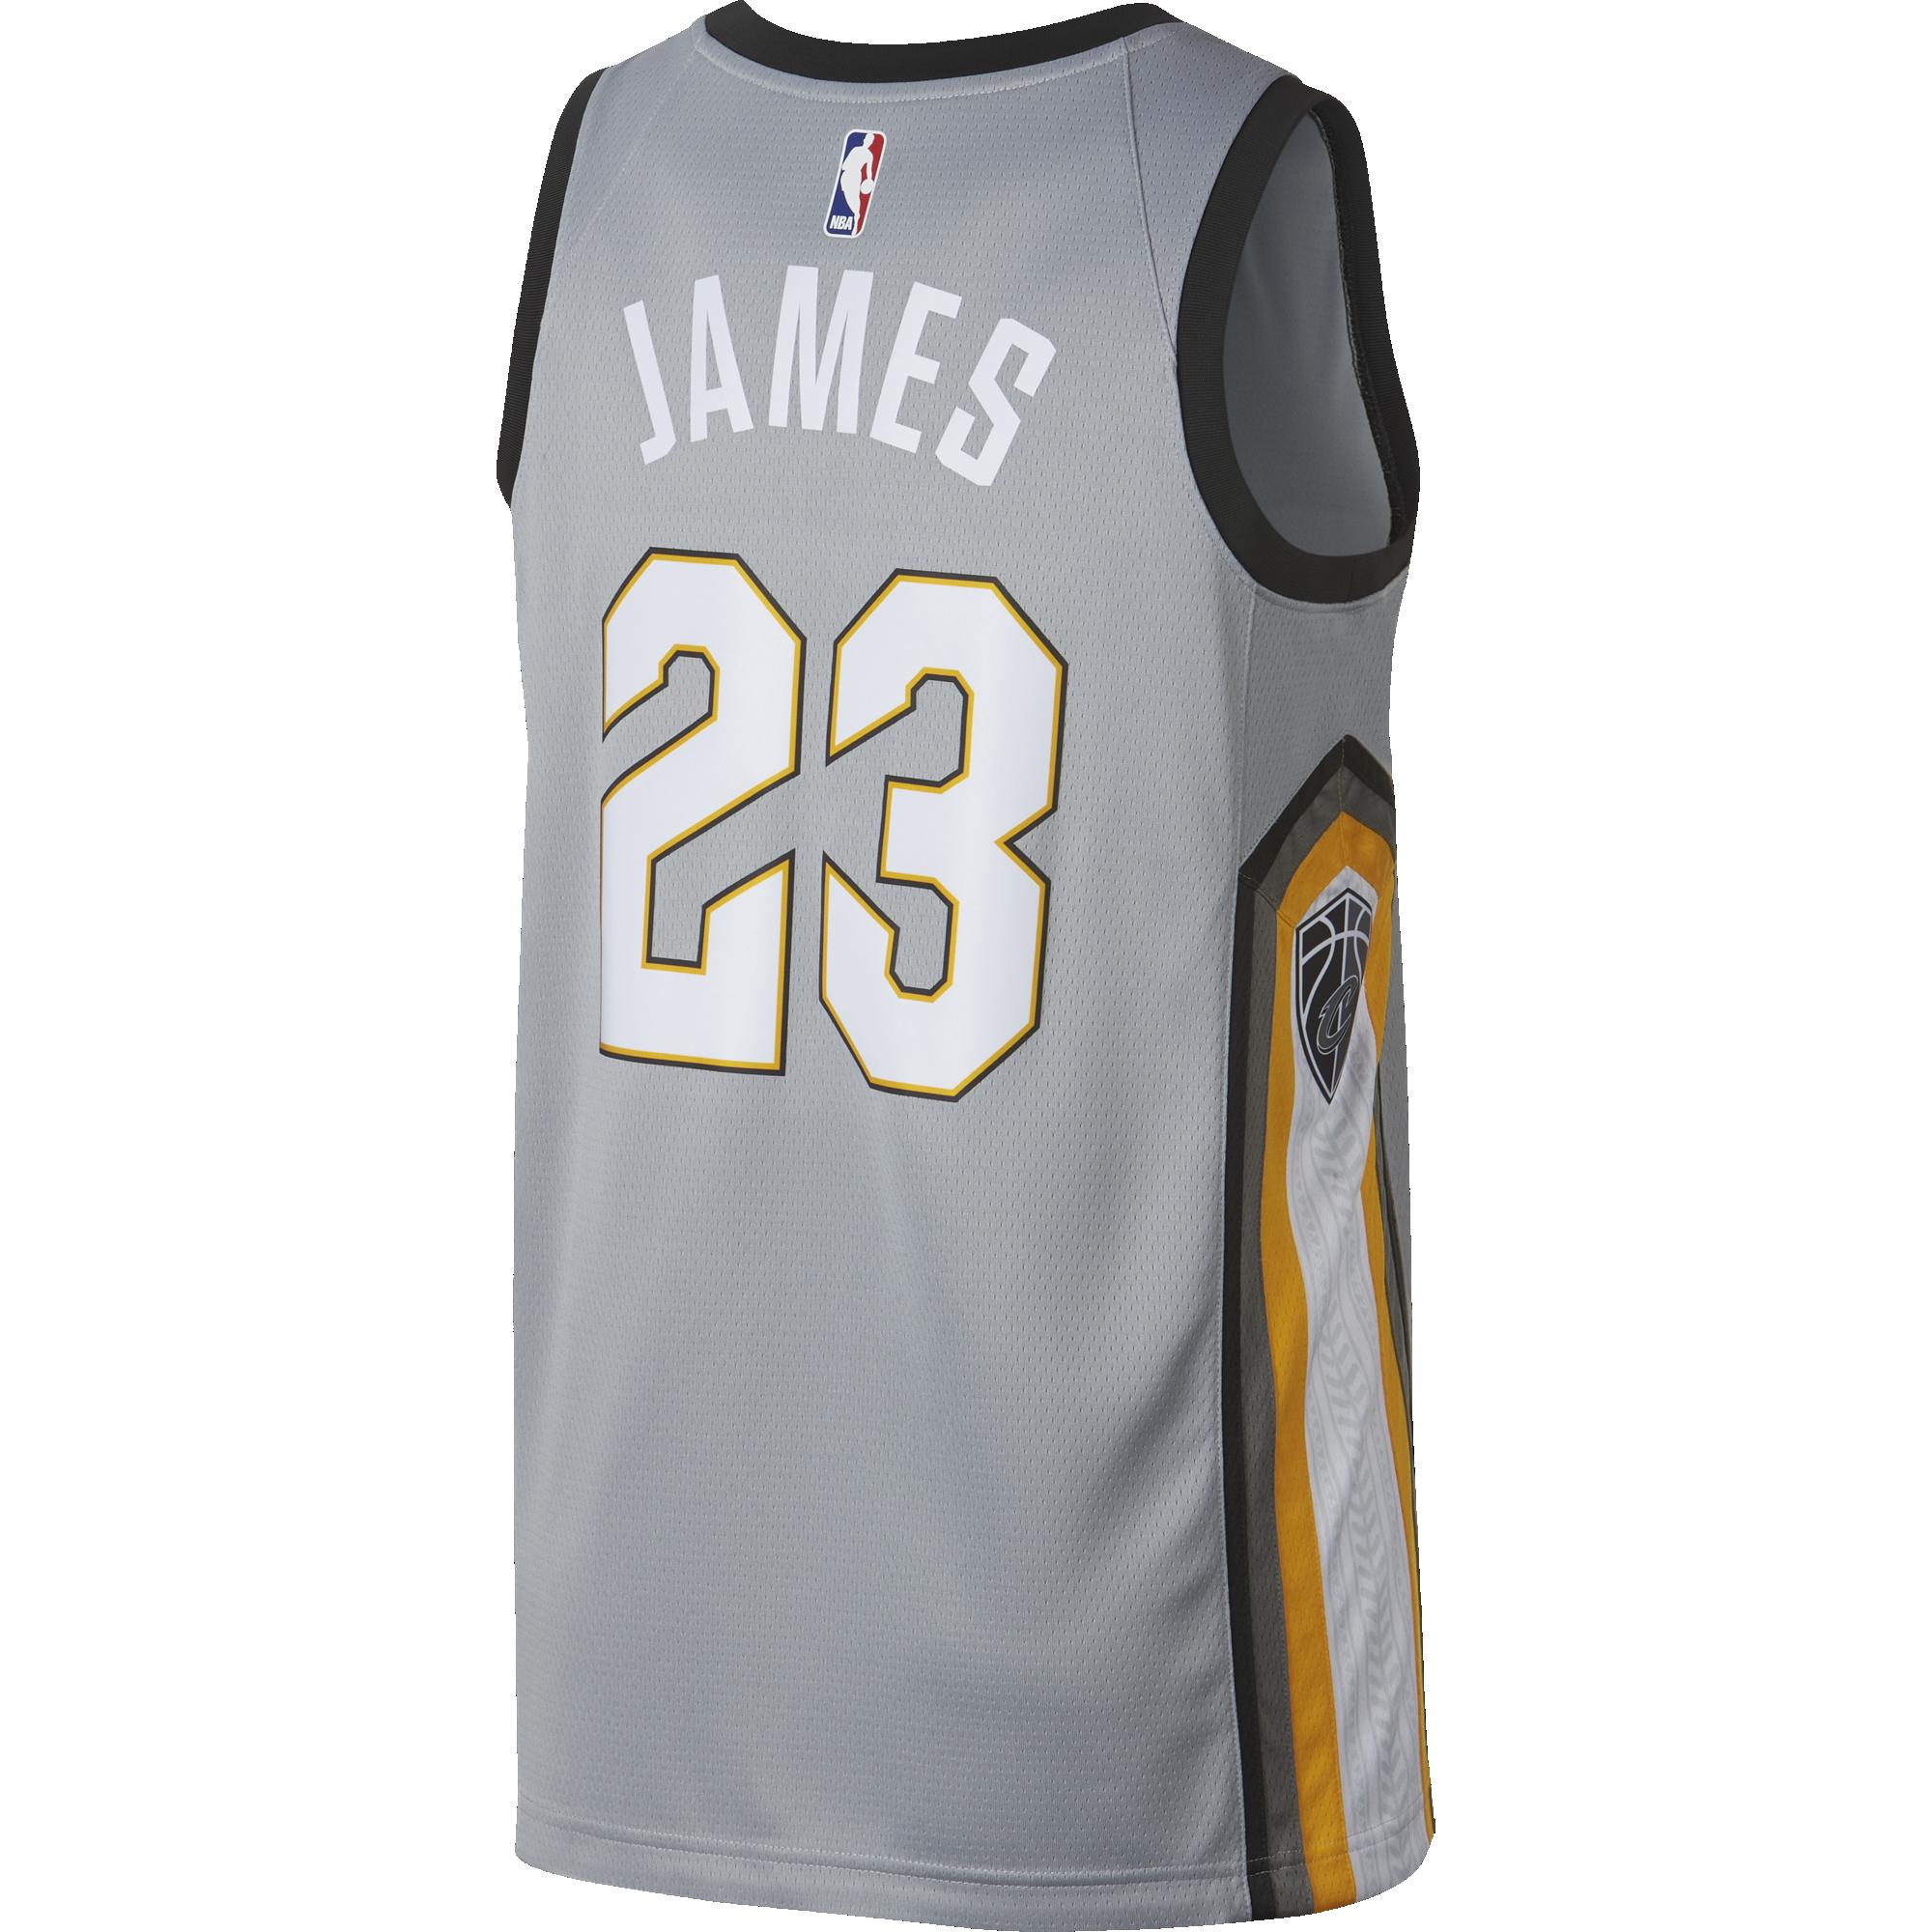 38324bcbaeb NIKE NBA LEBRON JAMES CLEVELAND CAVALIERS CITY EDITION SWINGMAN. Previous  Next